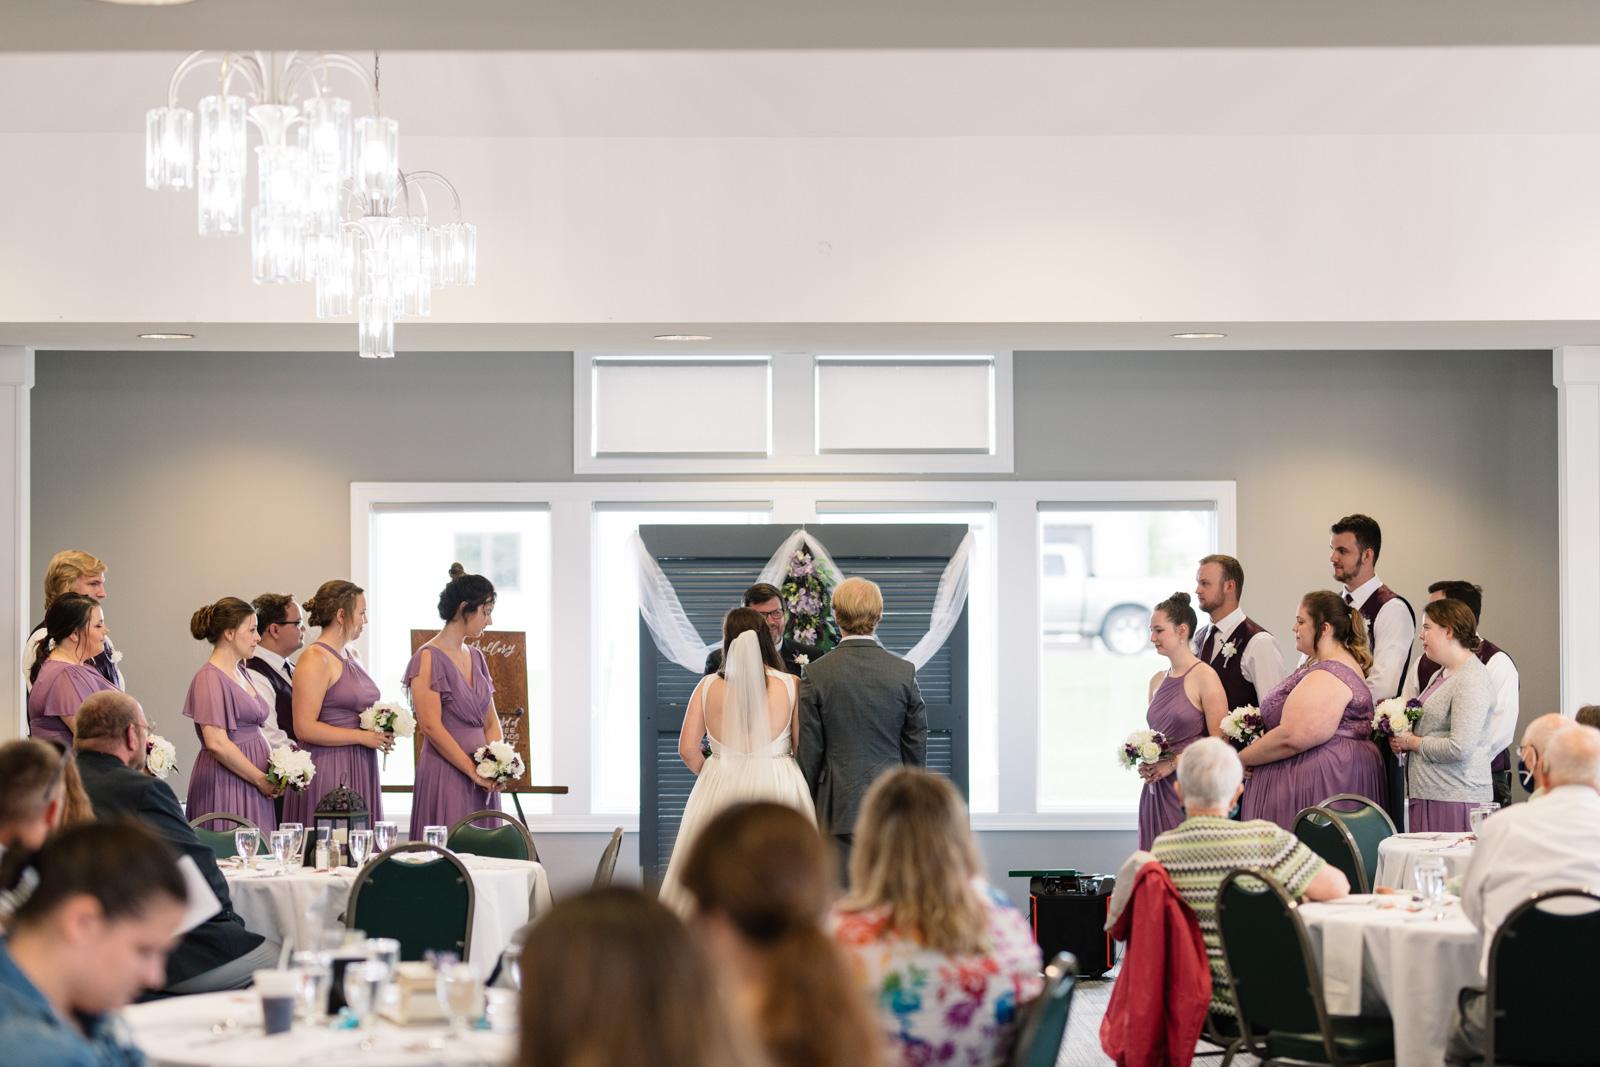 wedding ceremony at fox ridge golf course wedding venue